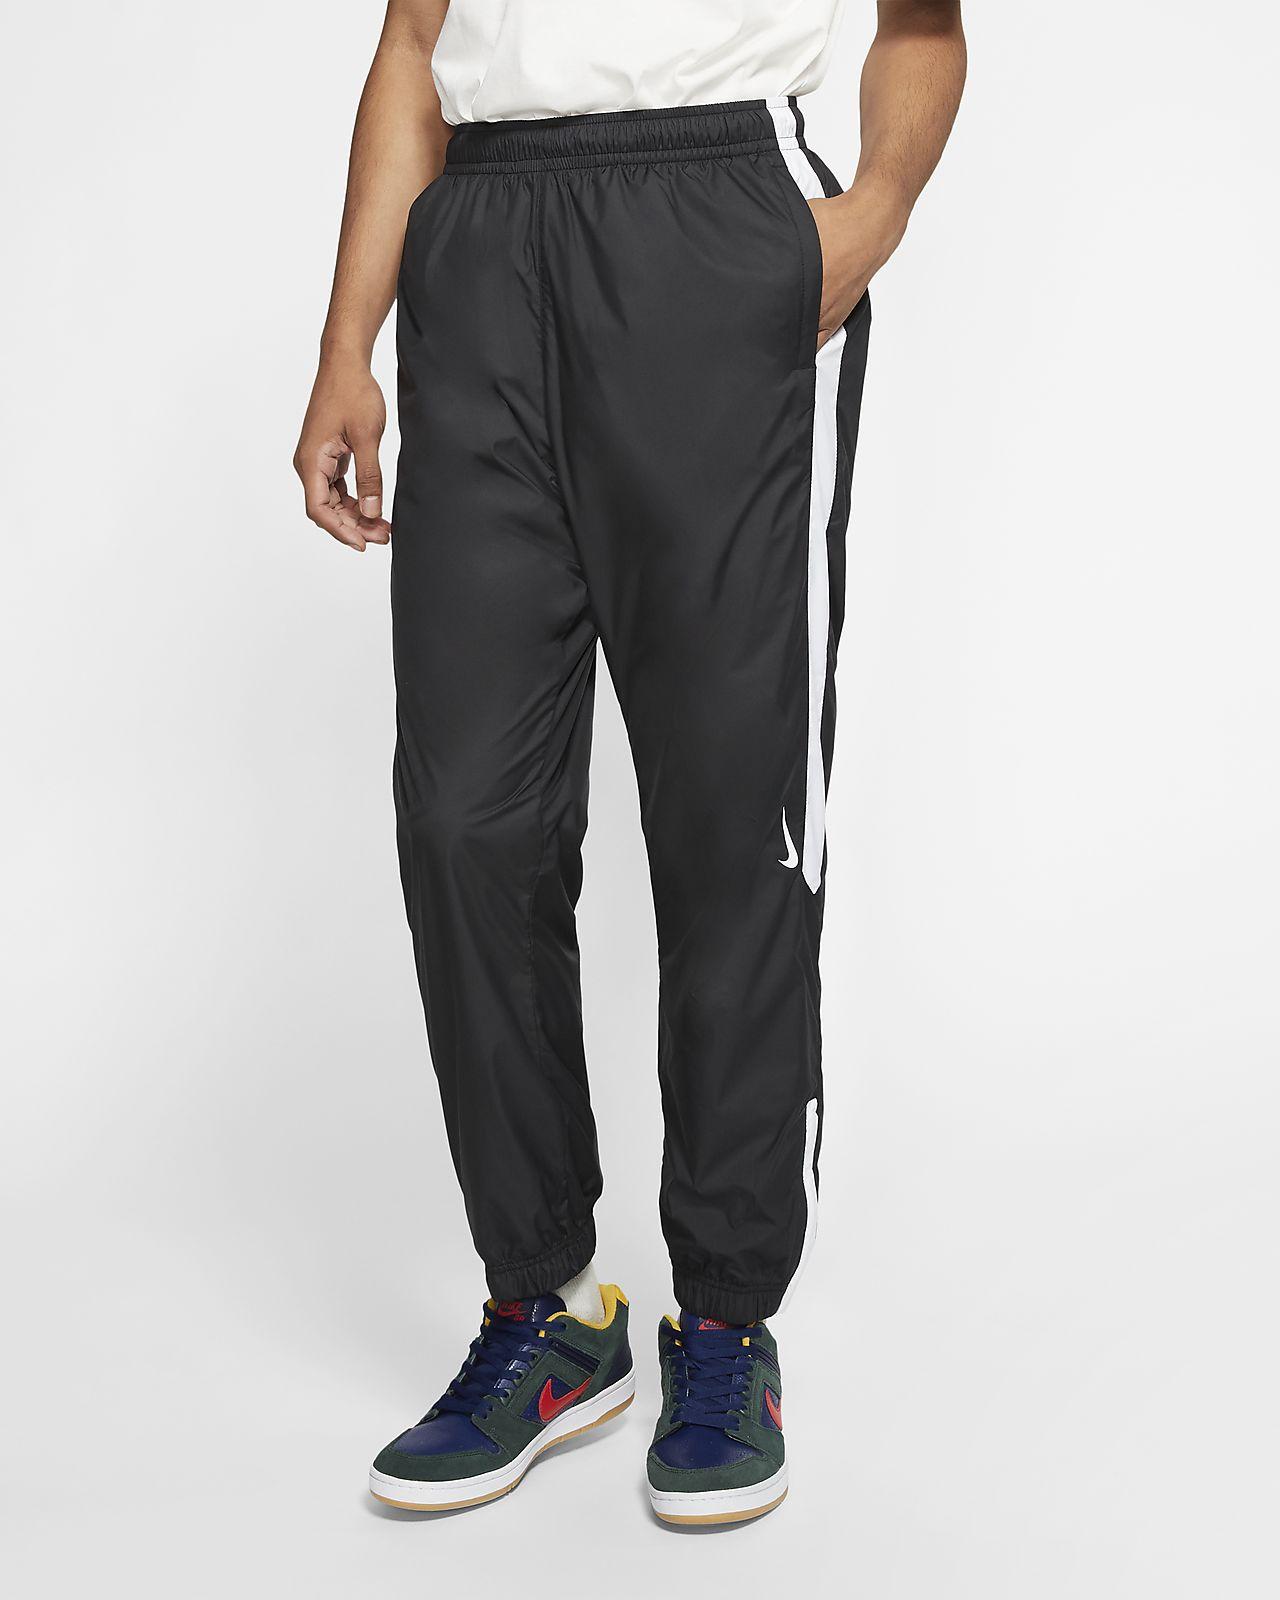 Nike SB Shield Swoosh 男子滑板长裤